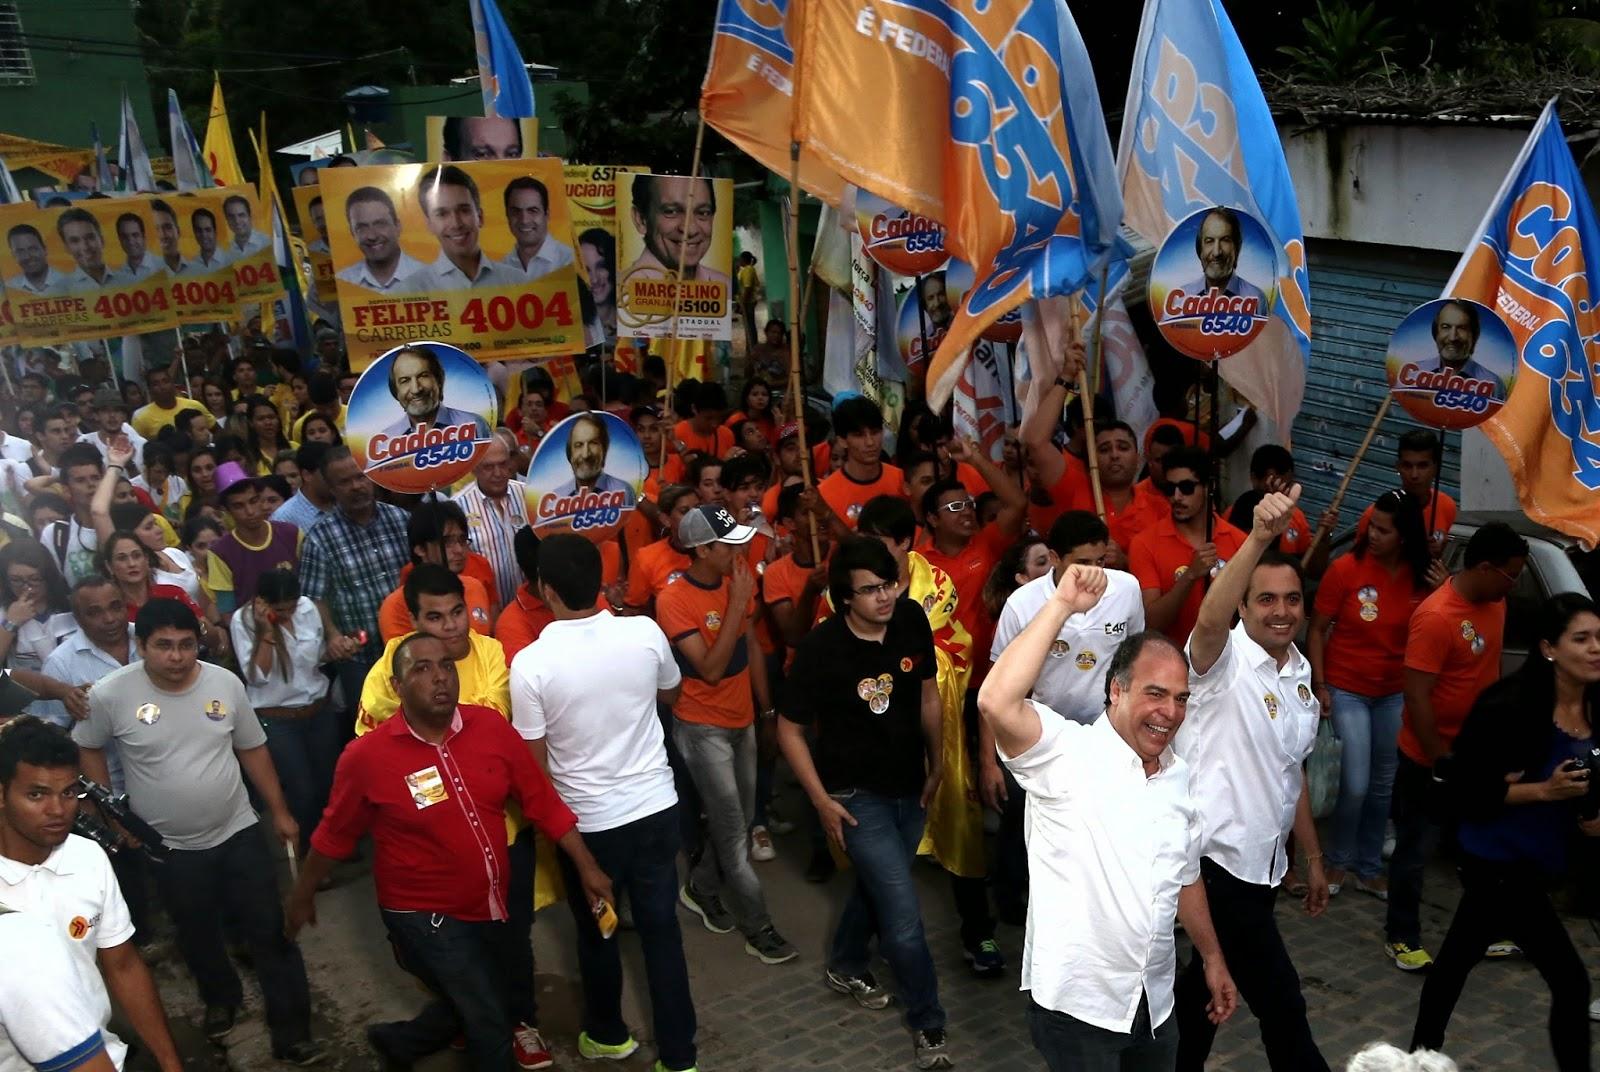 Frente Popular reedita Tribuna 40 em Olinda, Agreste news